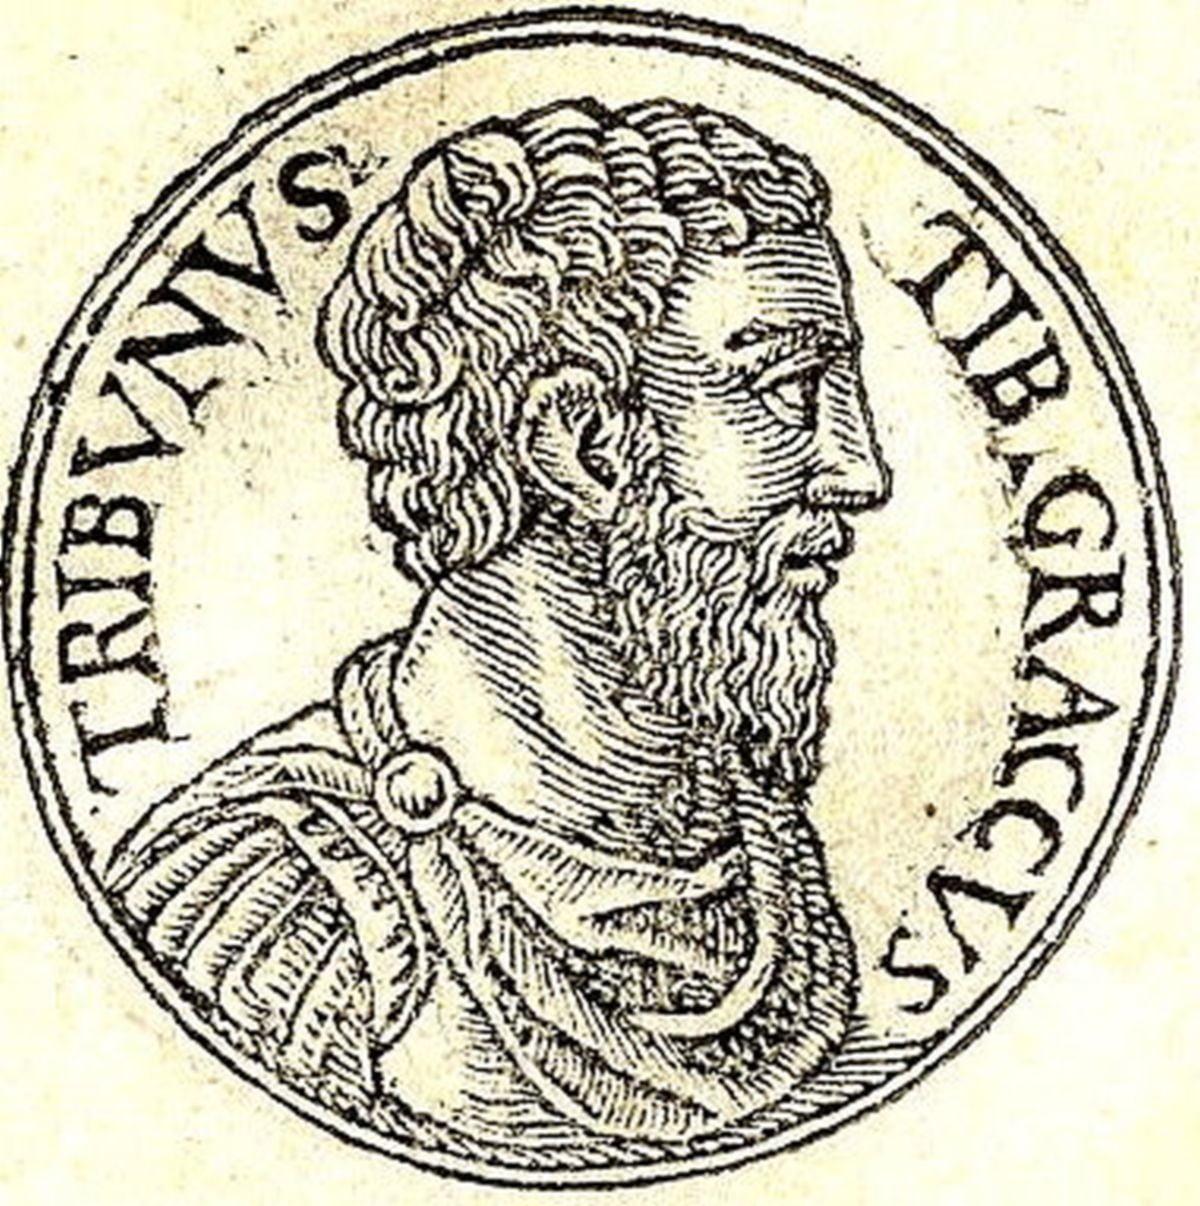 Tyberiusz Semproniusz Grakchus na rycinie